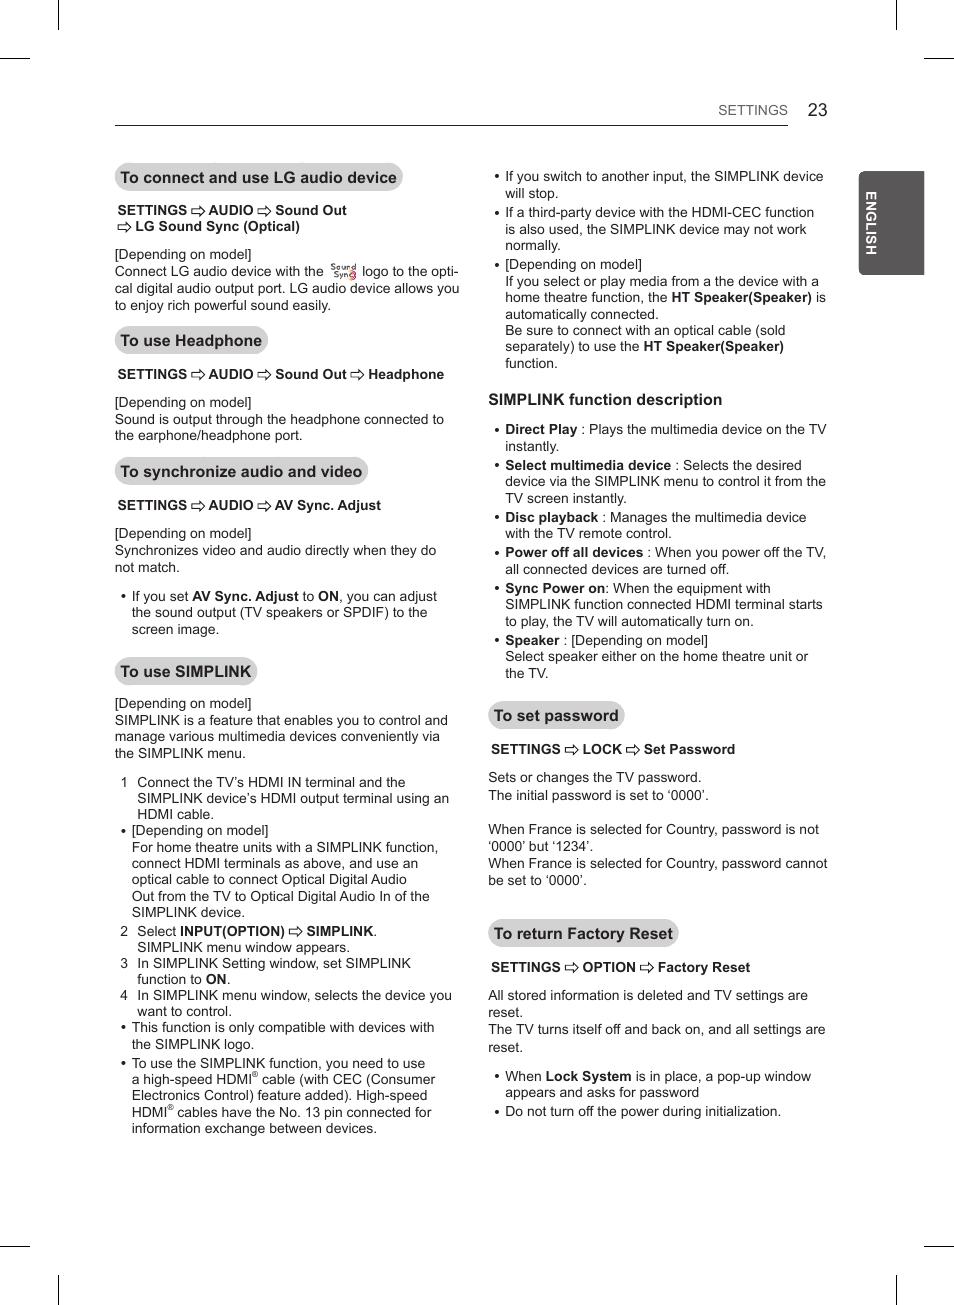 LG 55LB561V User Manual   Page 47 / 480   Also for: 55LB620V